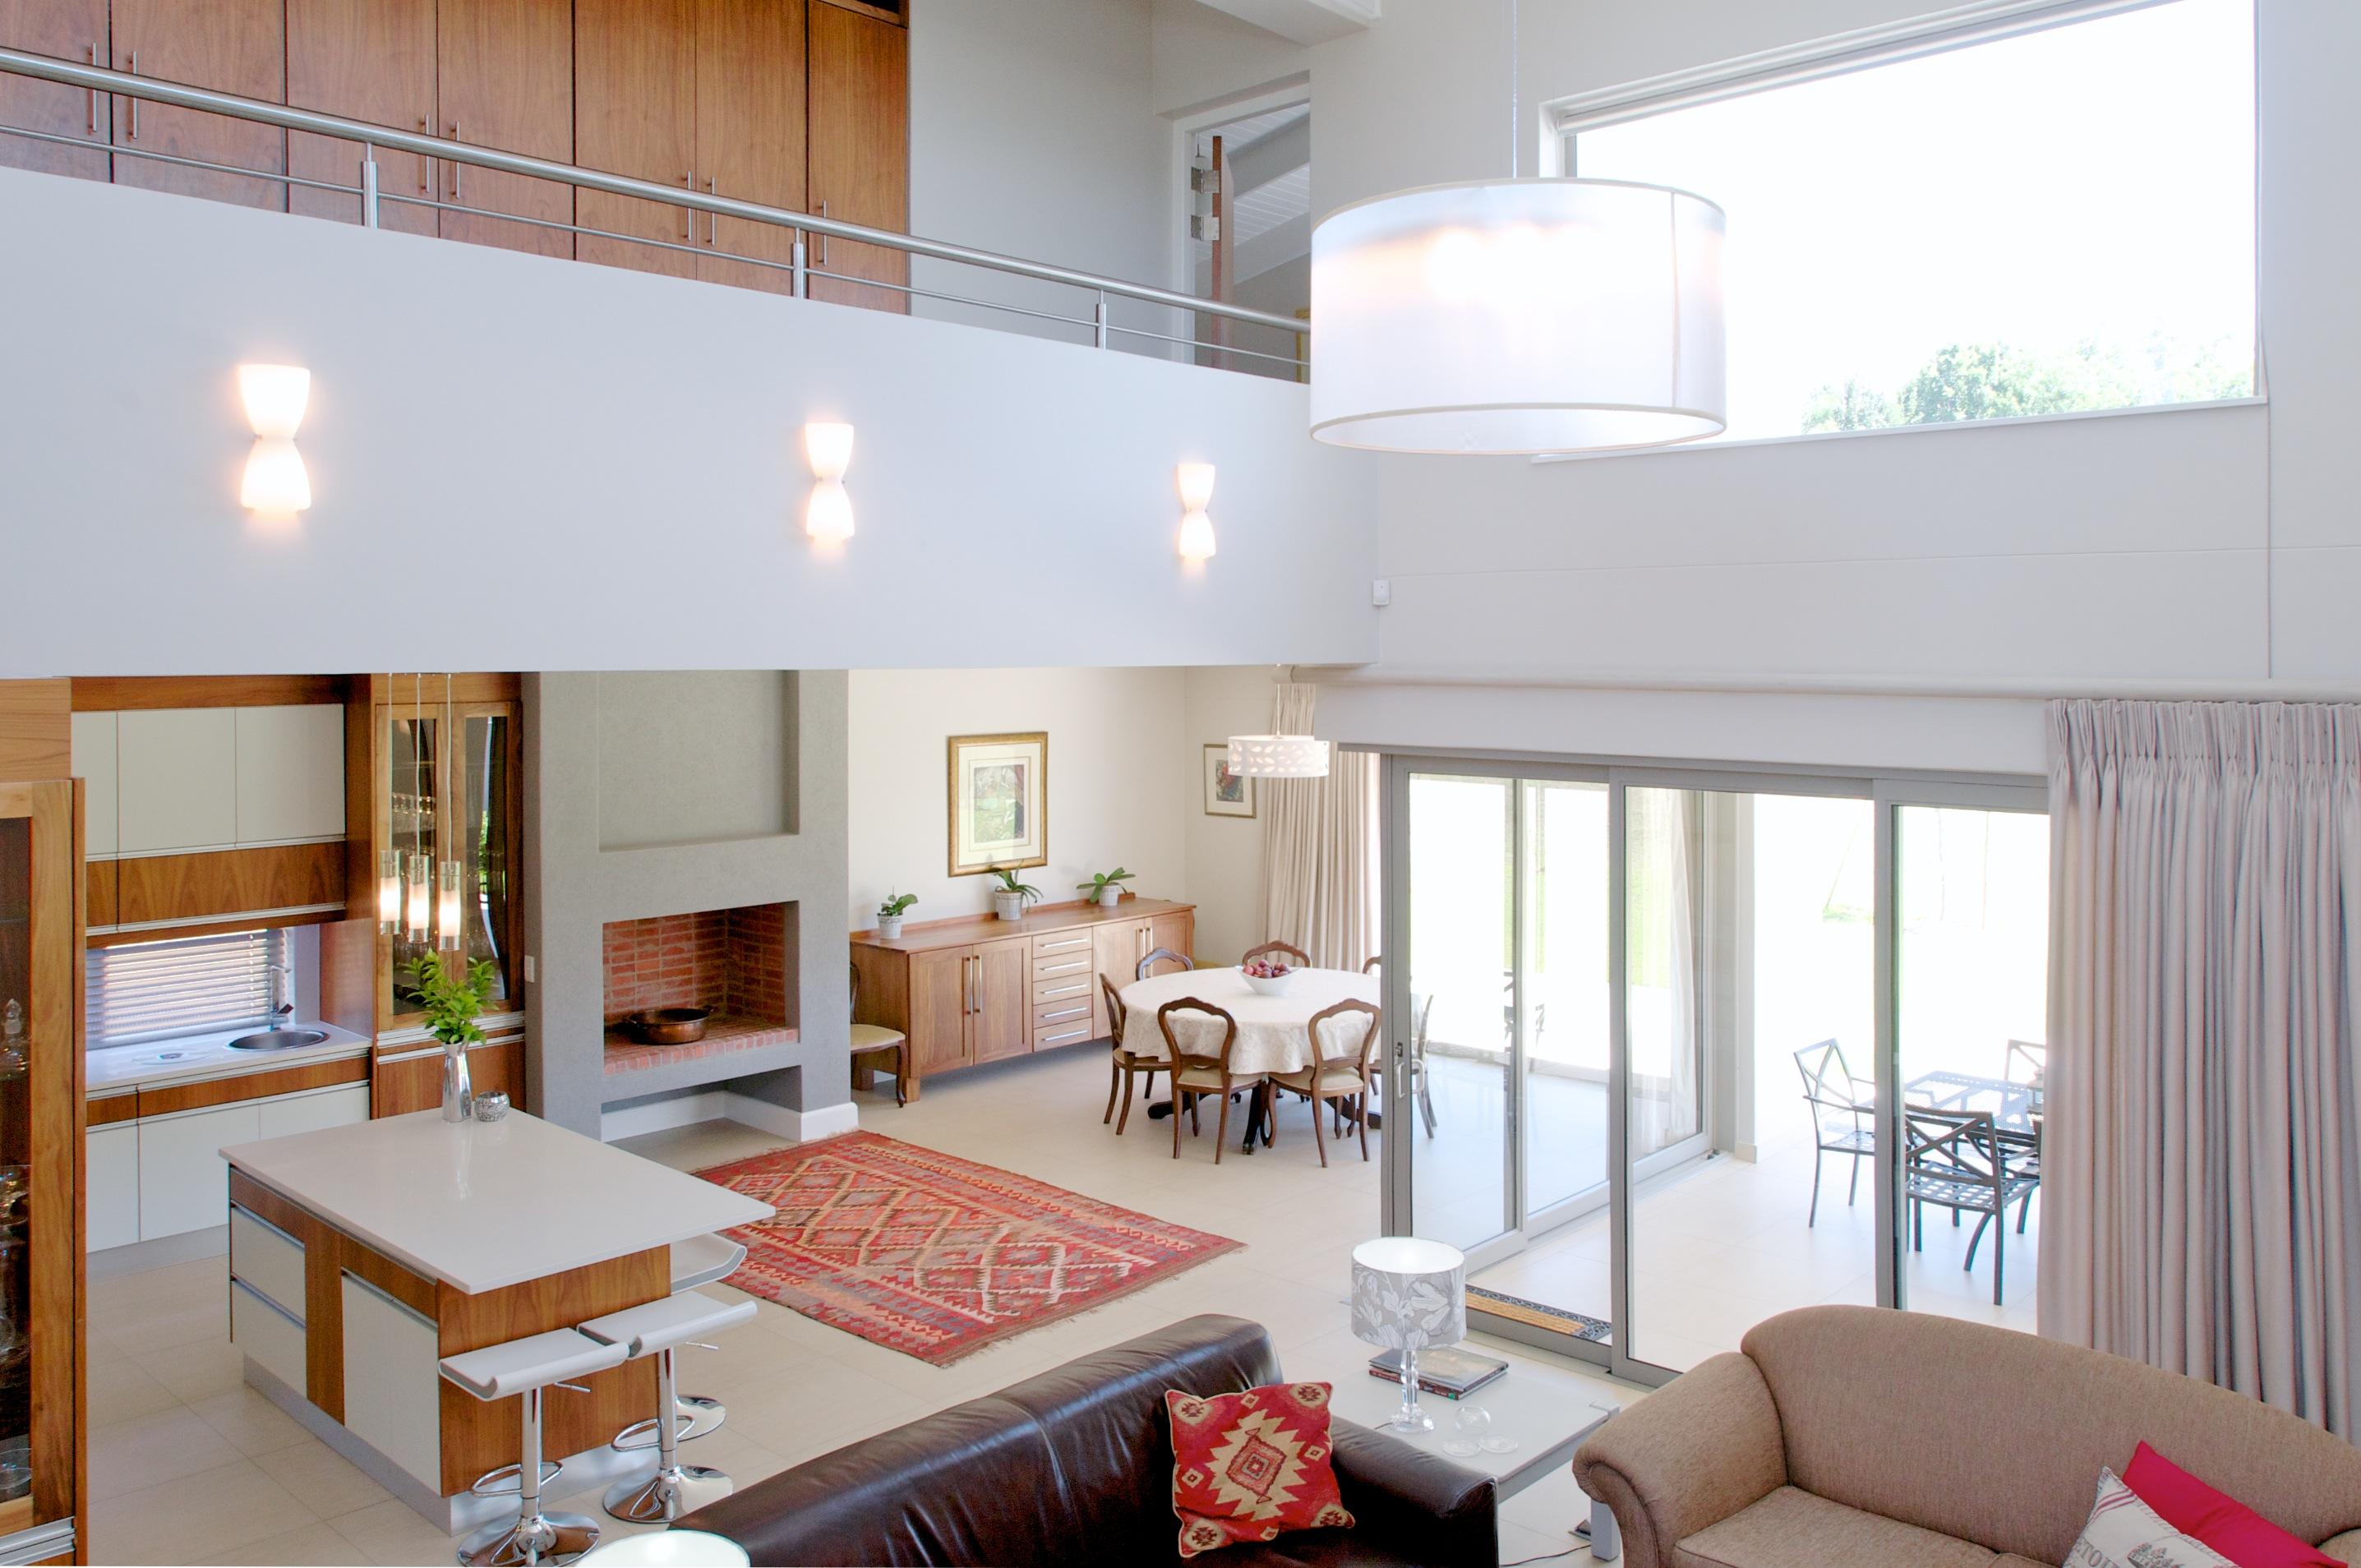 House Van Rensburg - Welgemoed Golf Course, Bellville - Van Biljon Bernardo Architects - Kwali Mark Costruction